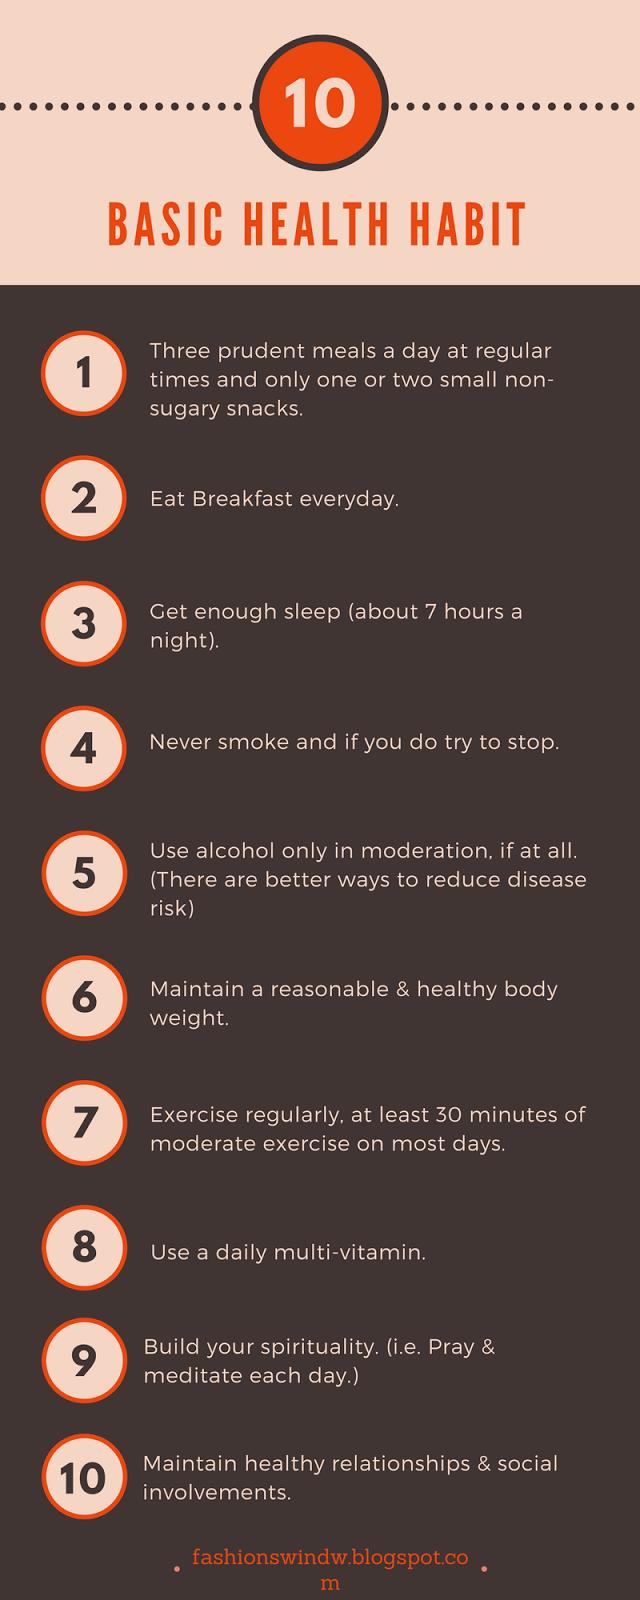 10 Basic Health Habits